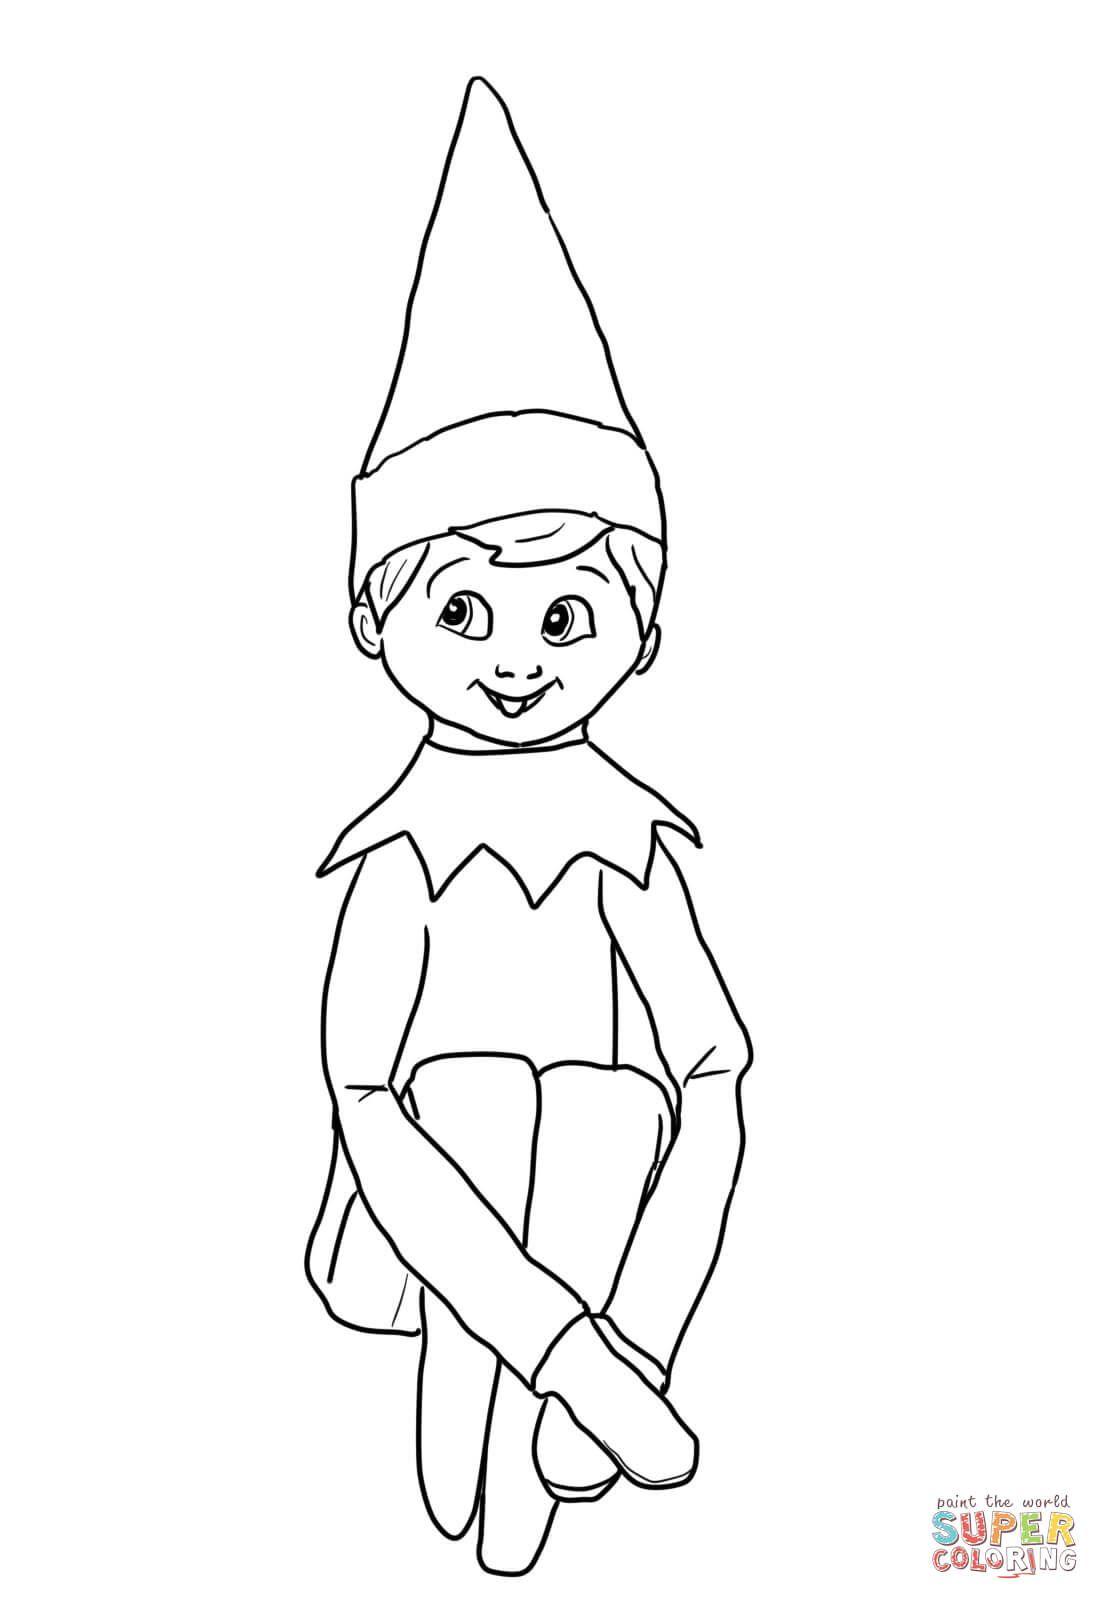 Christmas Elf On Shelf Coloring Page Free Printable Coloring Pages Christmas Coloring Sheets Santa Coloring Pages Printable Christmas Coloring Pages